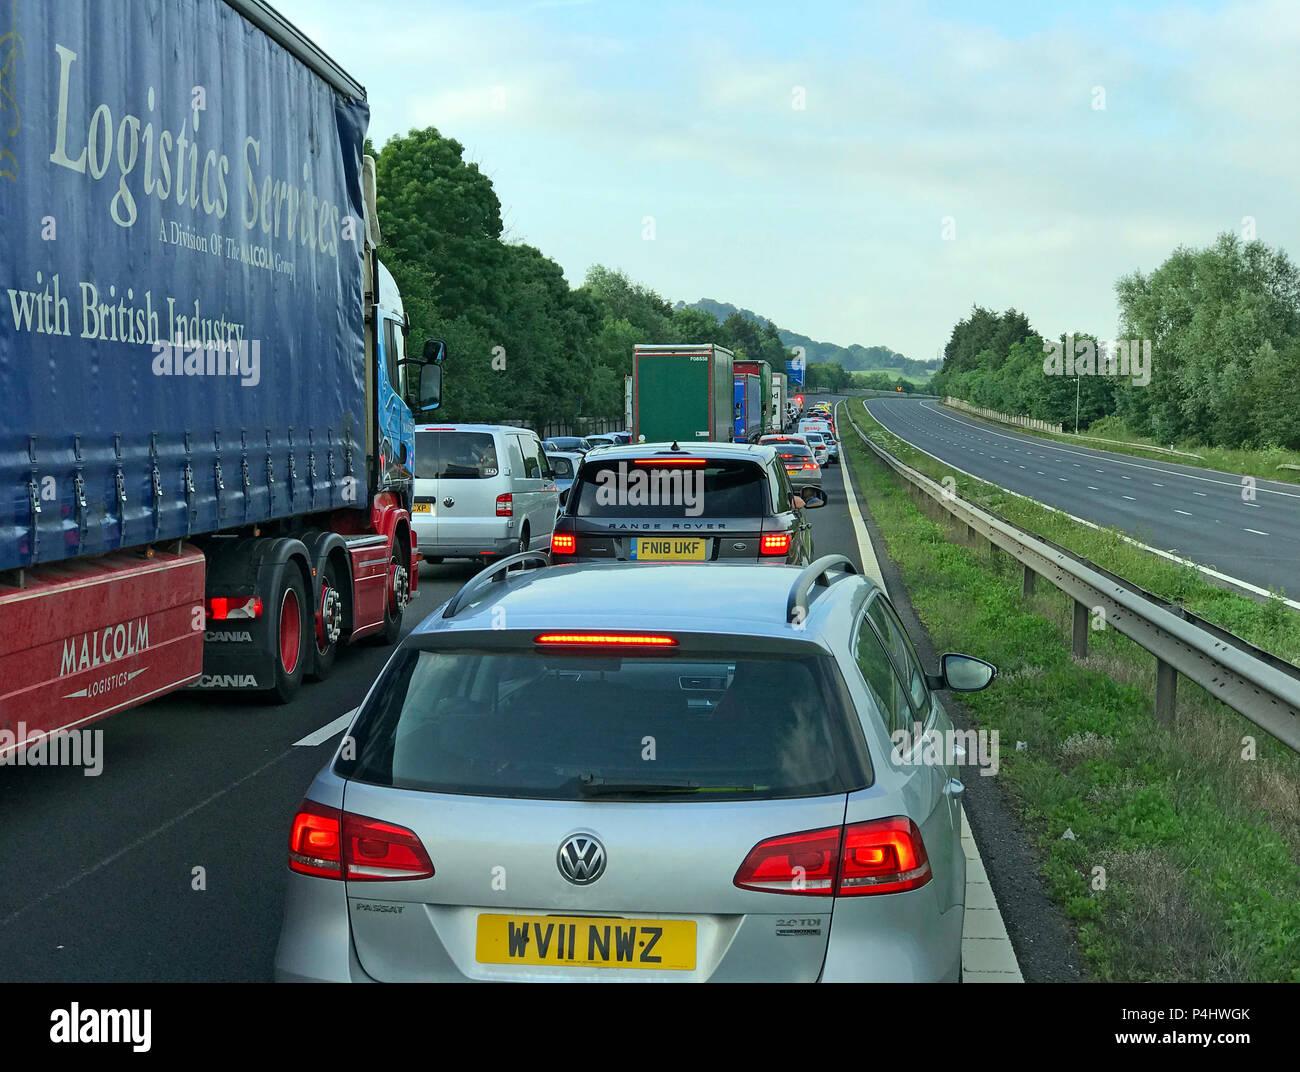 GoTonySmith,@HotpixUK,HotpixUK,cars,trucks,vans,stop,stopped,stationary,England UK road network,M5,Traffic Jam,with an empty,Motorway,road,England,UK,M6,M1,M25,Traffic,congestion,Jam,empty,lane,lanes,opposite,carriageway,roads,network,Motorway Accident